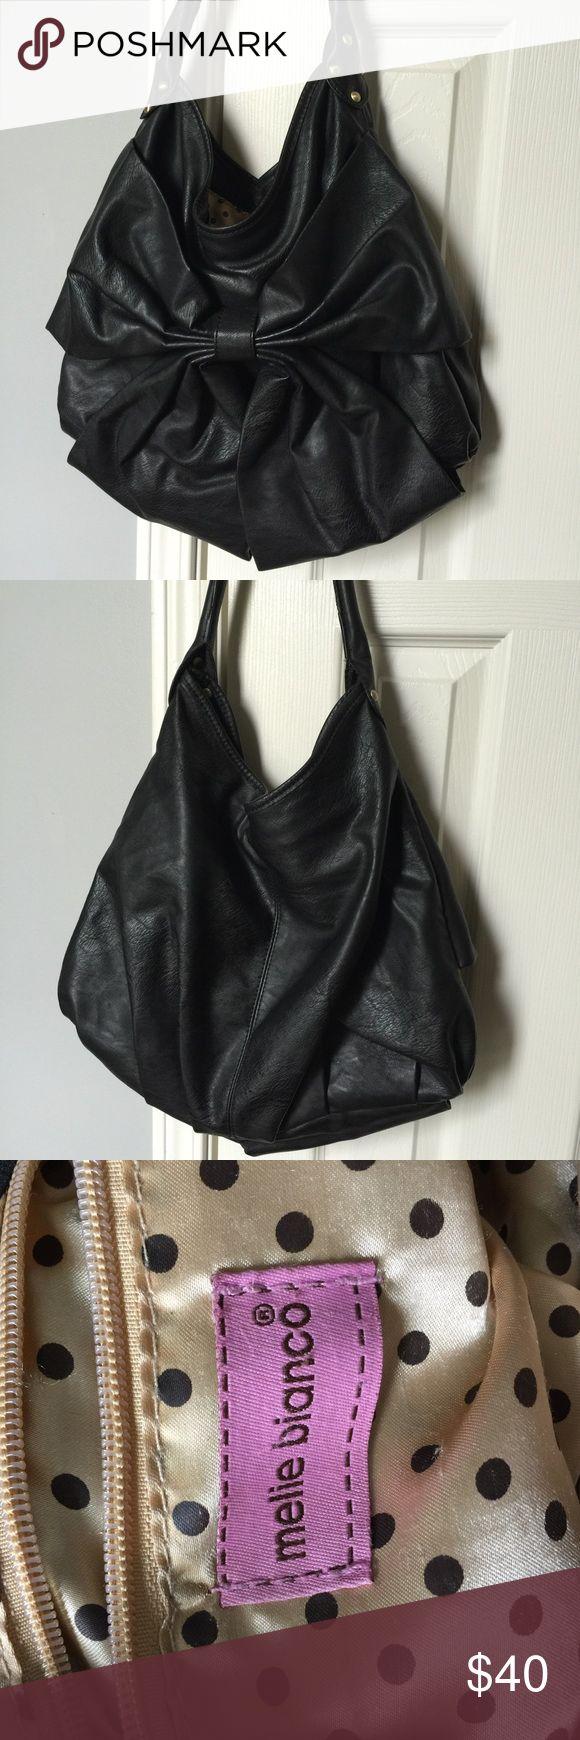 Melie Bianco Black Bow Purse Adorable black bow Melie Bianco purse A barely used! Melie Bianco Bags Shoulder Bags